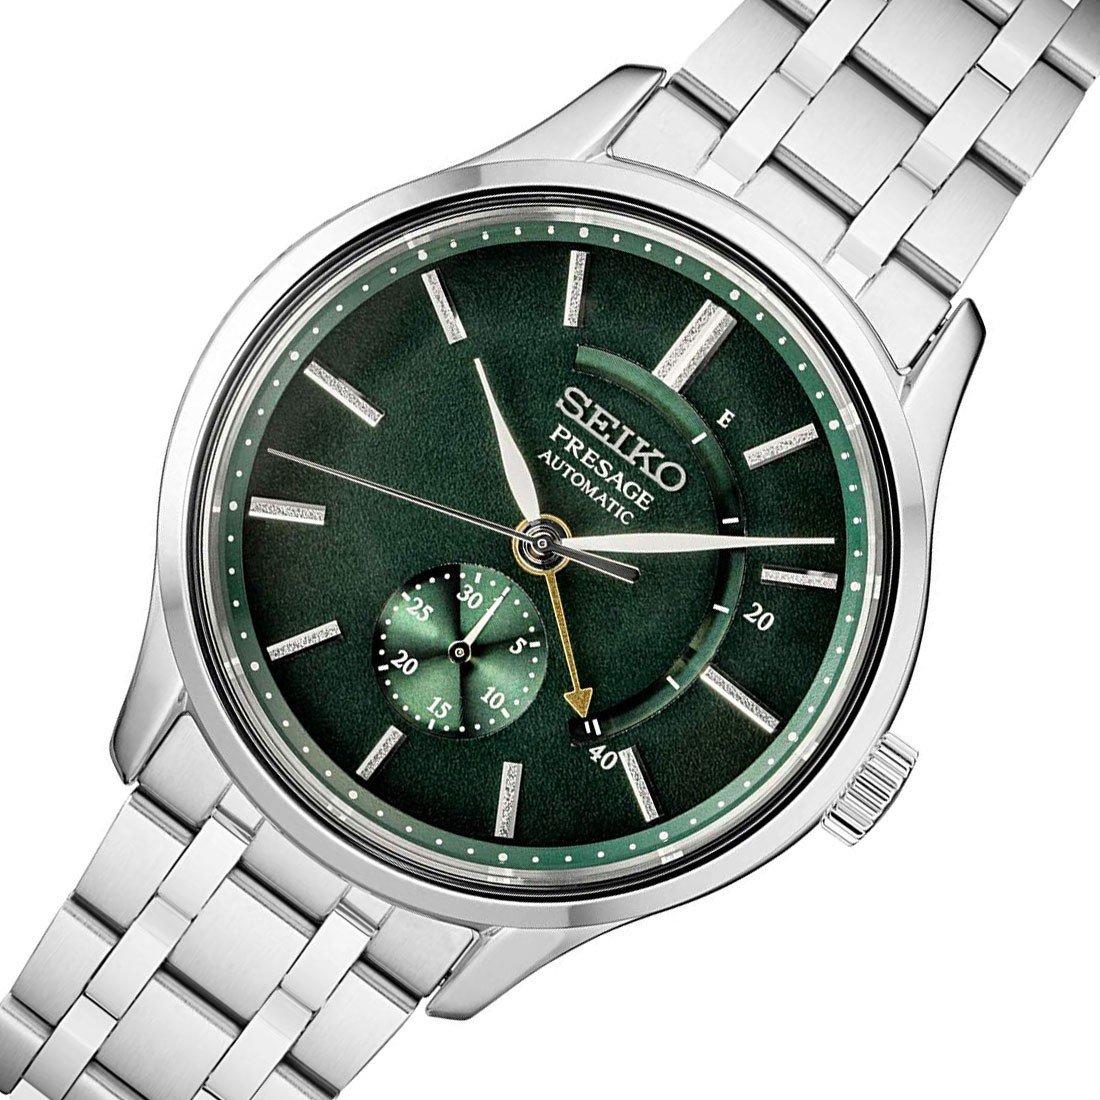 "Seiko Presage ""Zen Garden"" 42mm Automatic Bracelet Watch SSA397J1 4R57 Power Reserve, Green, Sapphire Crystal £359 @ Simpkins Jewellers"